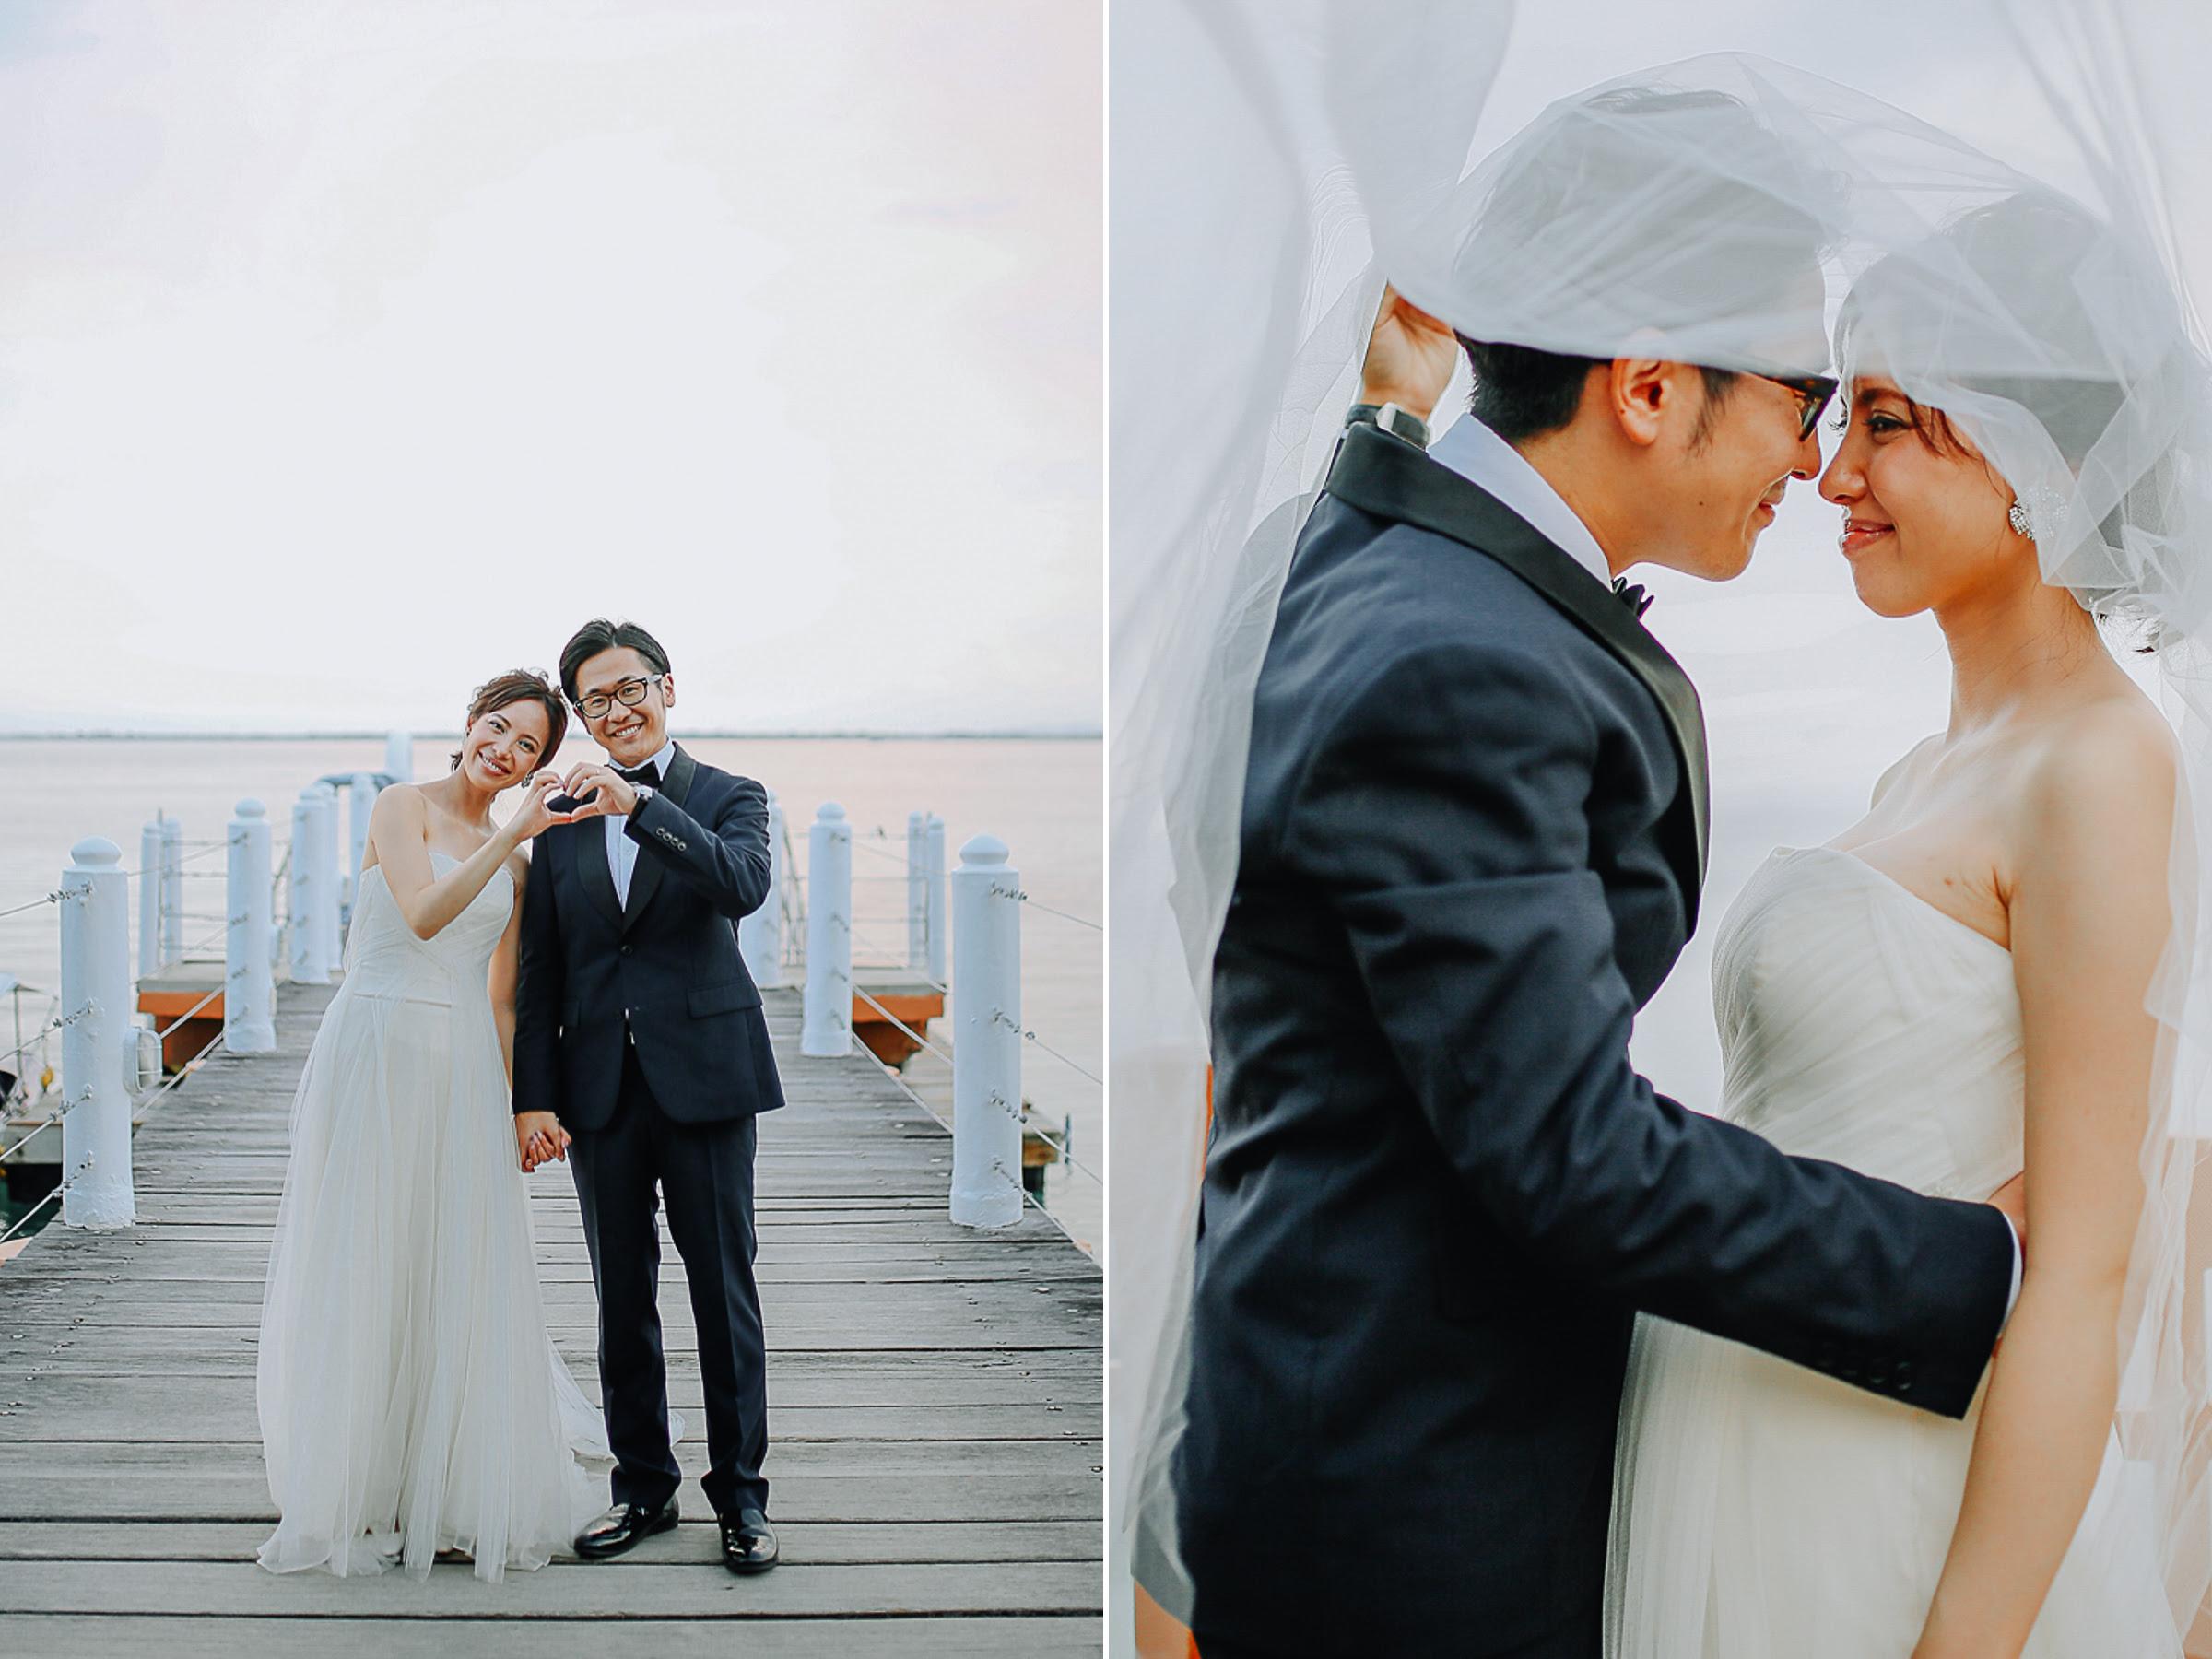 Shangrila Destination Wedding